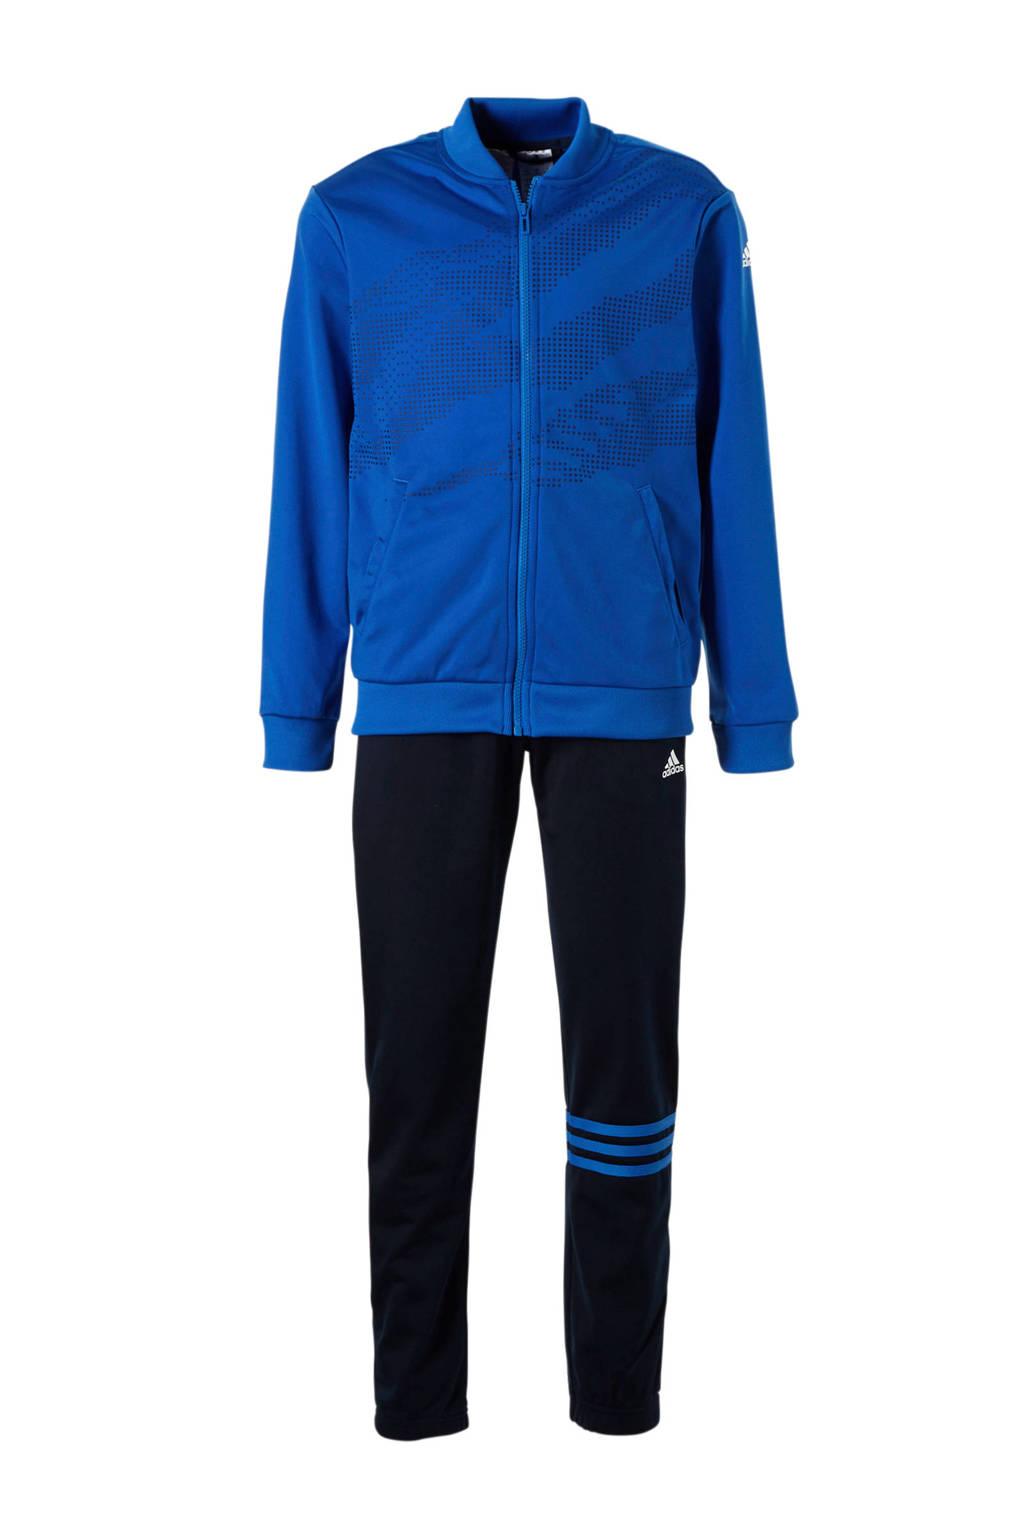 adidas performance   trainingspak, Blauw/zwart